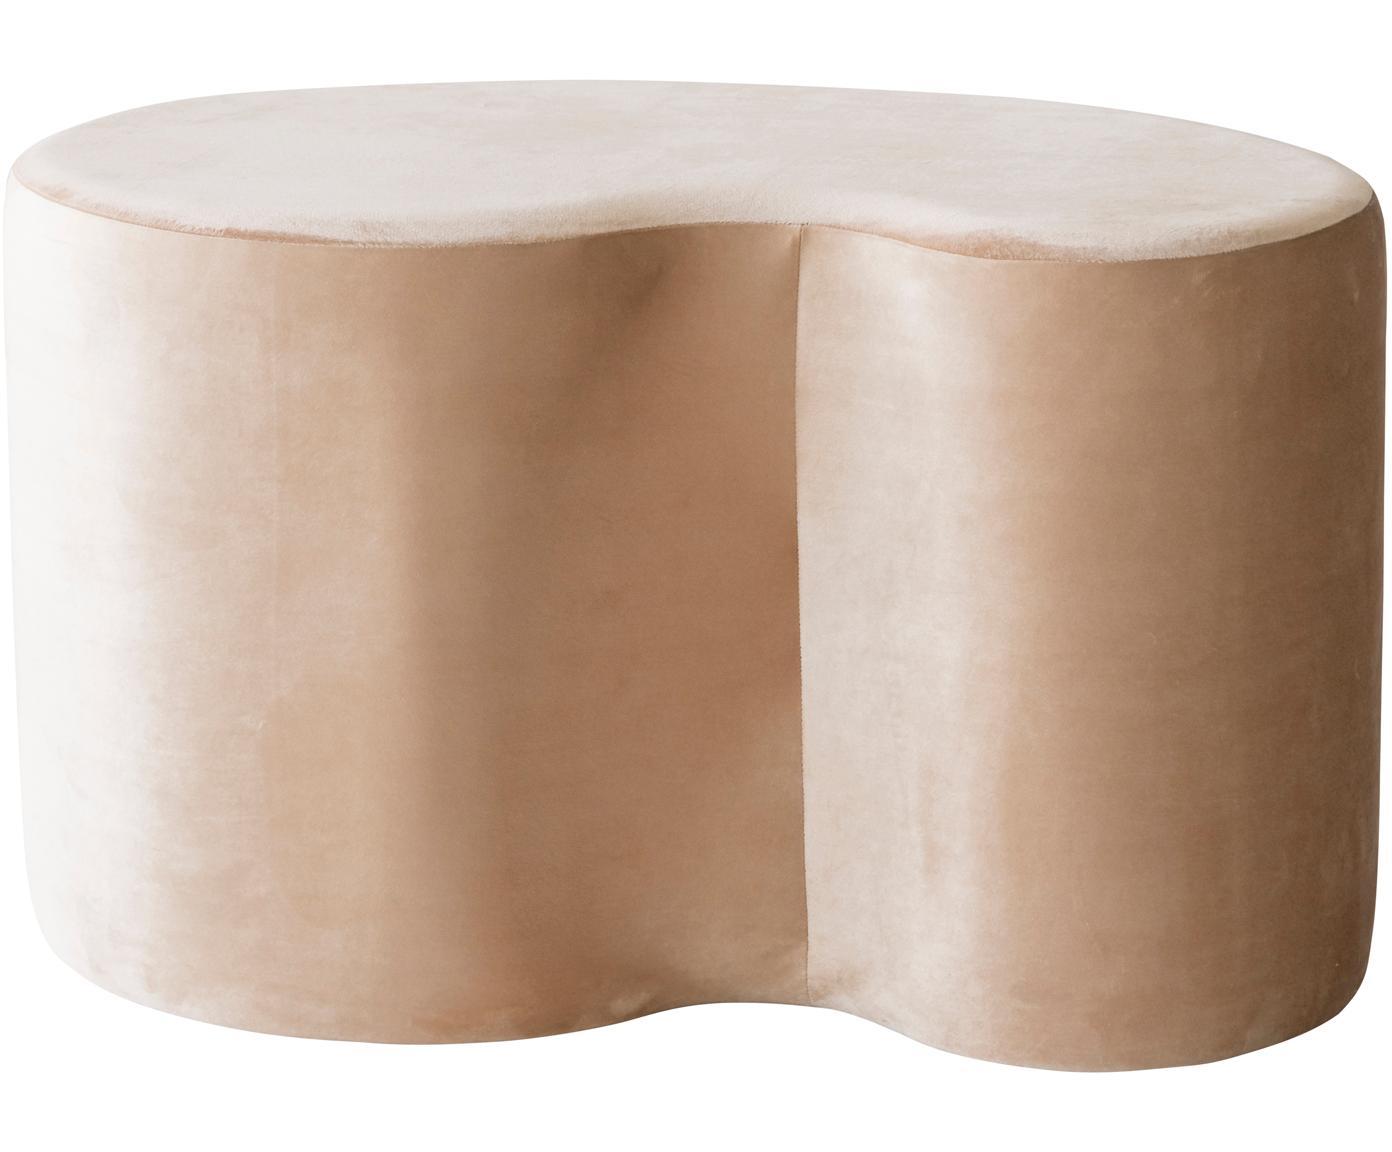 Pouf in velluto beige Cloe, Rivestimento: velluto di poliestere luc, Struttura: pannelli di fibra a media, Beige, Larg. 80 x Prof. 50 cm